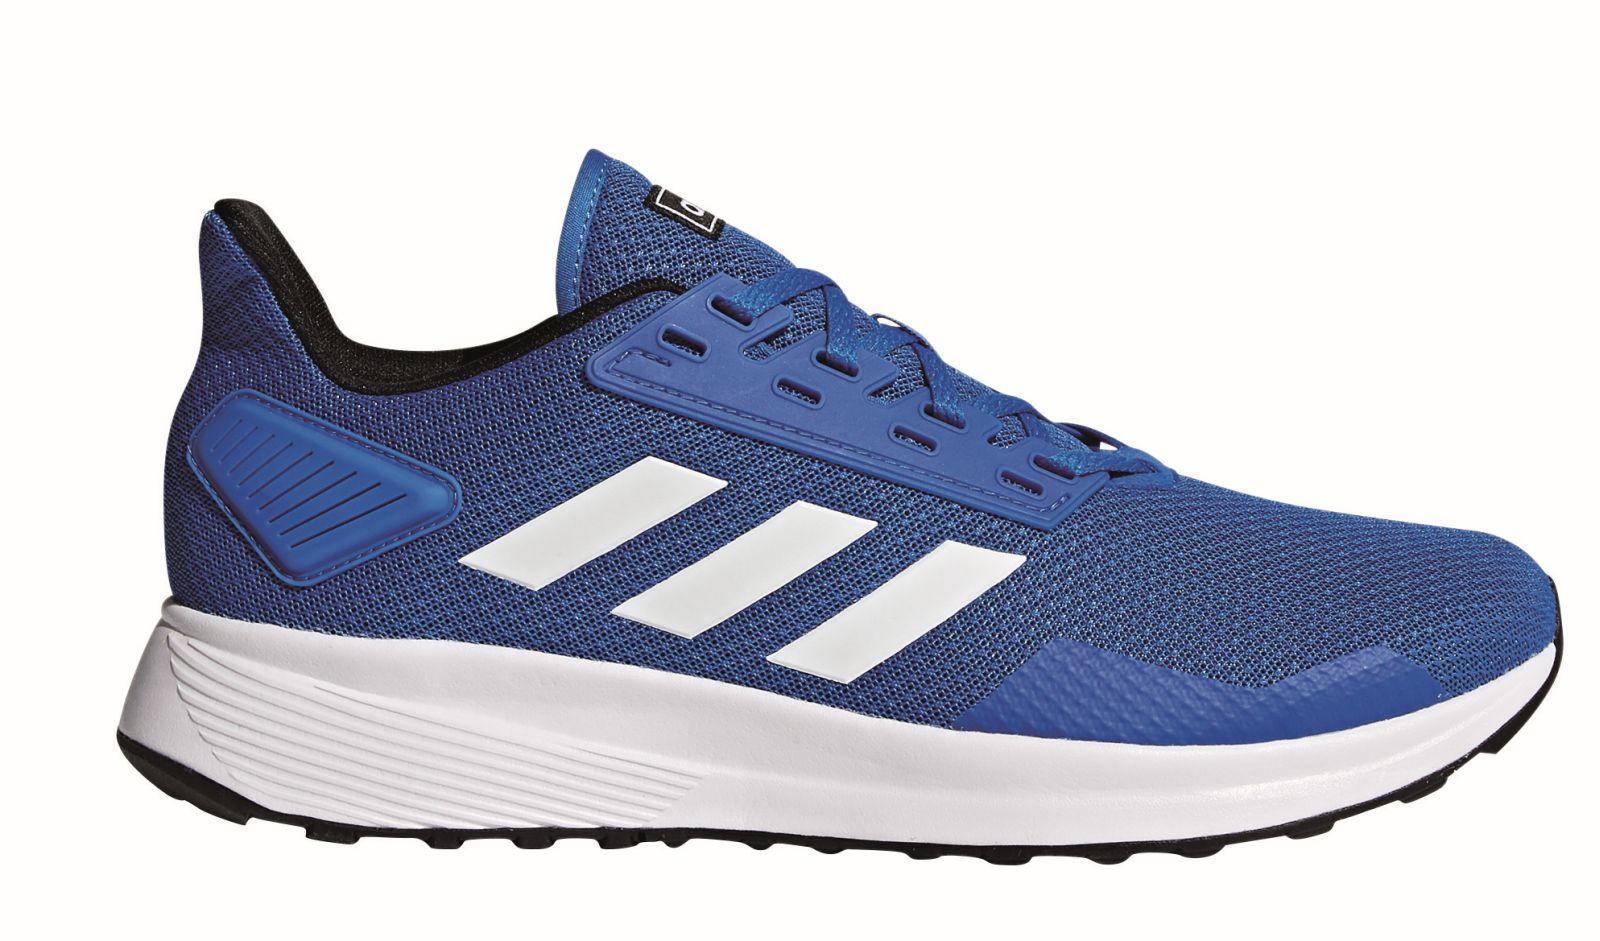 Herren Performance Laufschuh zu 9 Details adidas Running Schuh Duramo blau DHE29IWY